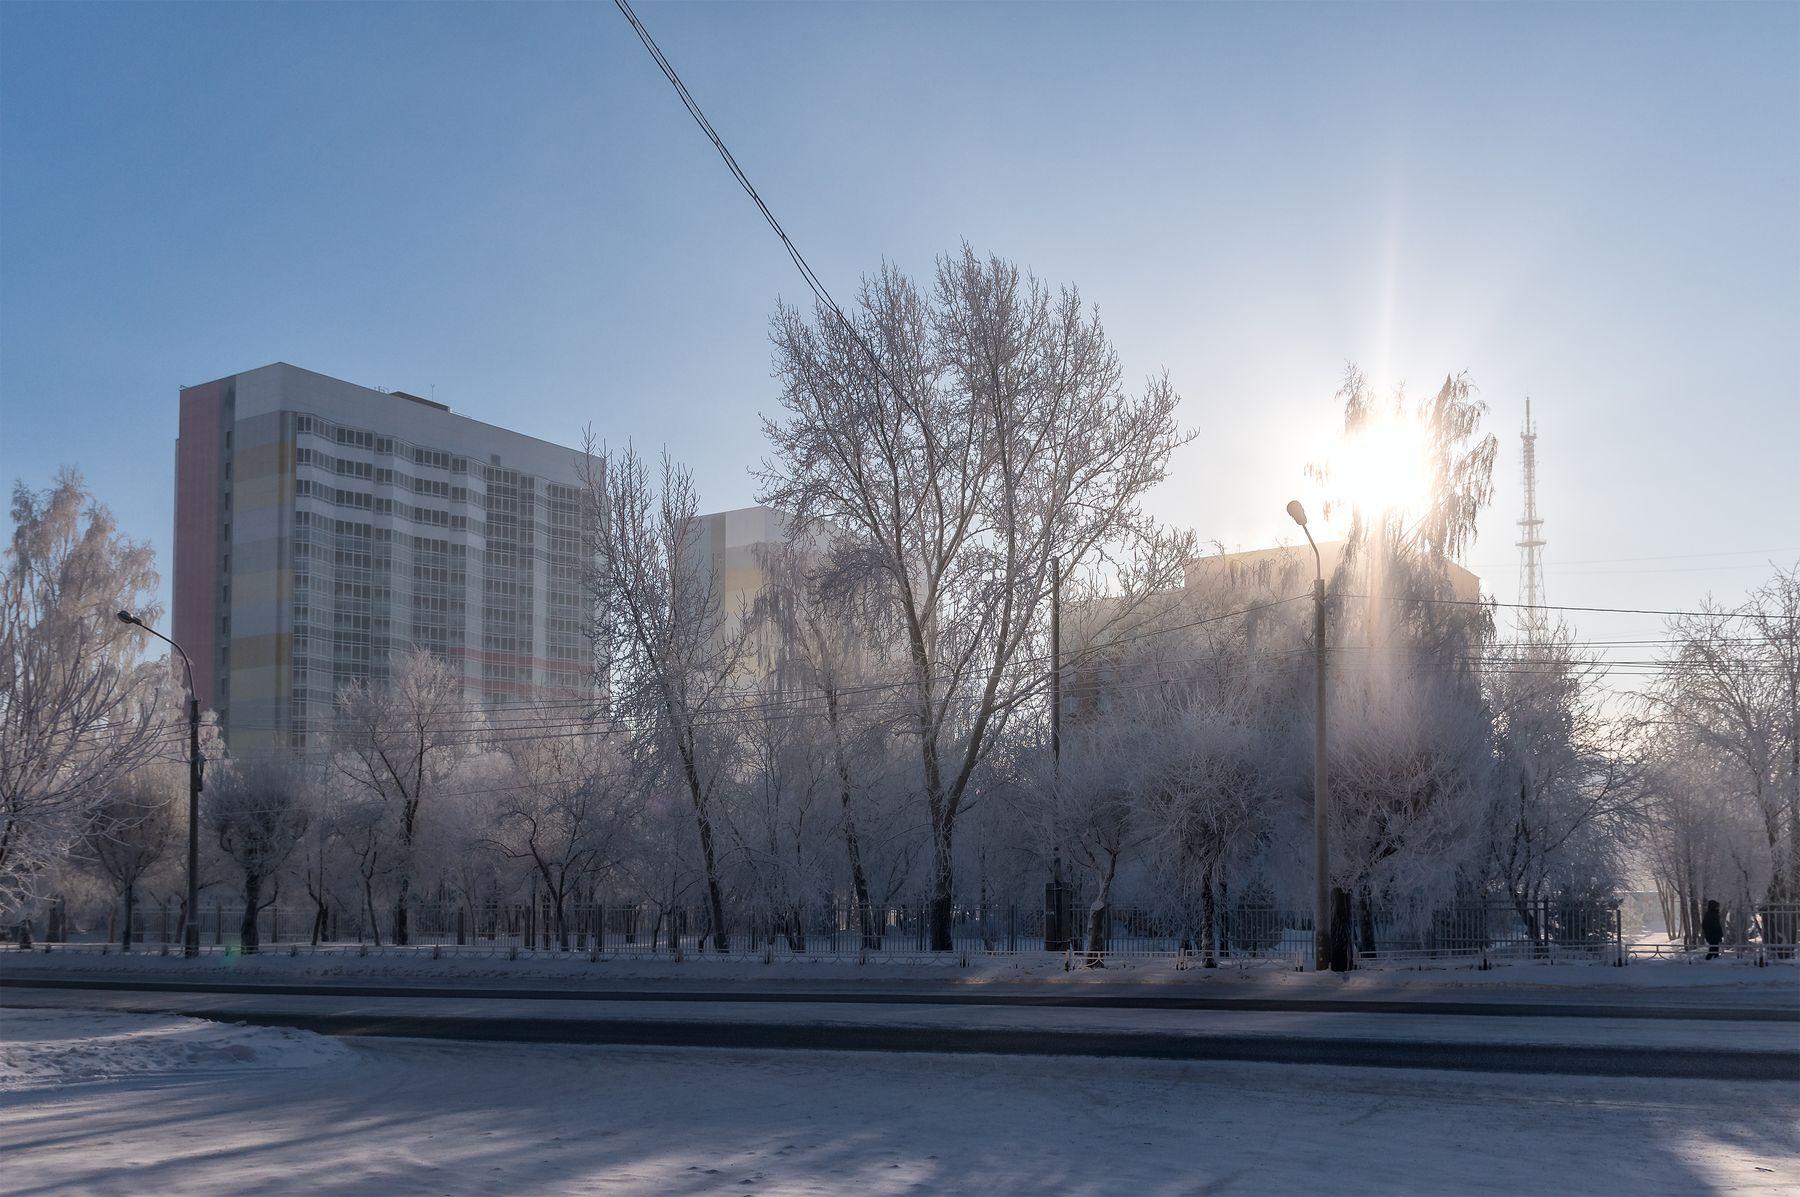 Cold Sun Красноярск зима иней